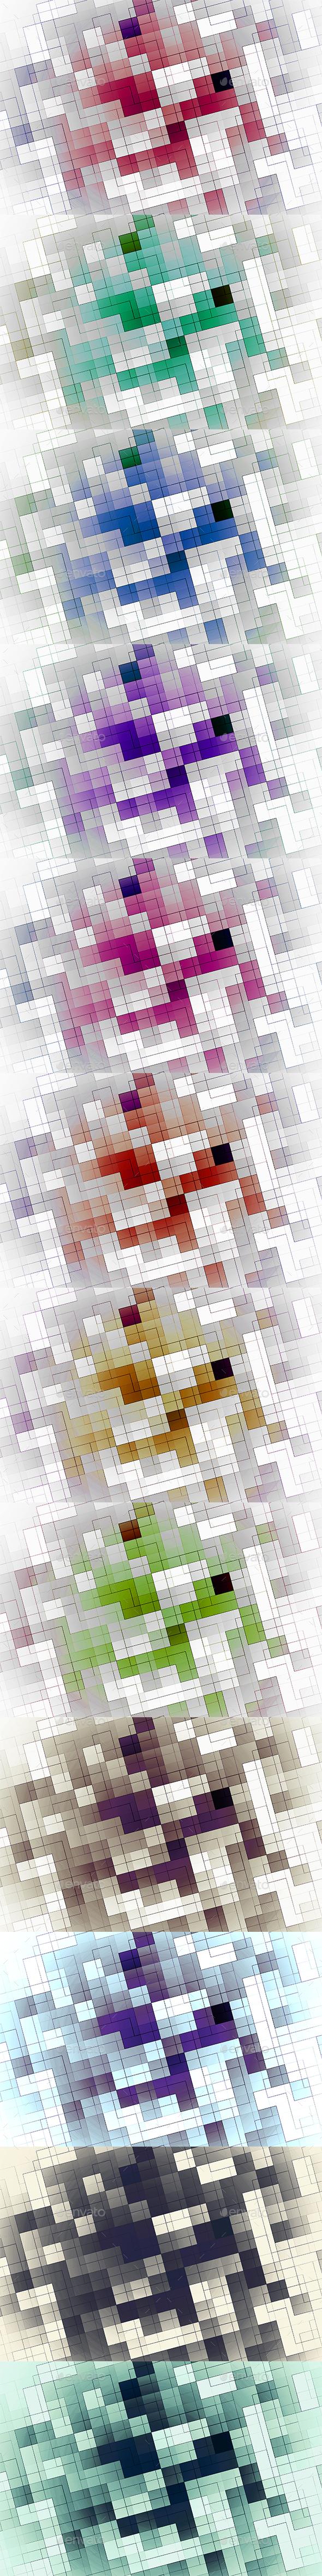 Digital Pixel Backgrounds Vol2 - Patterns Backgrounds